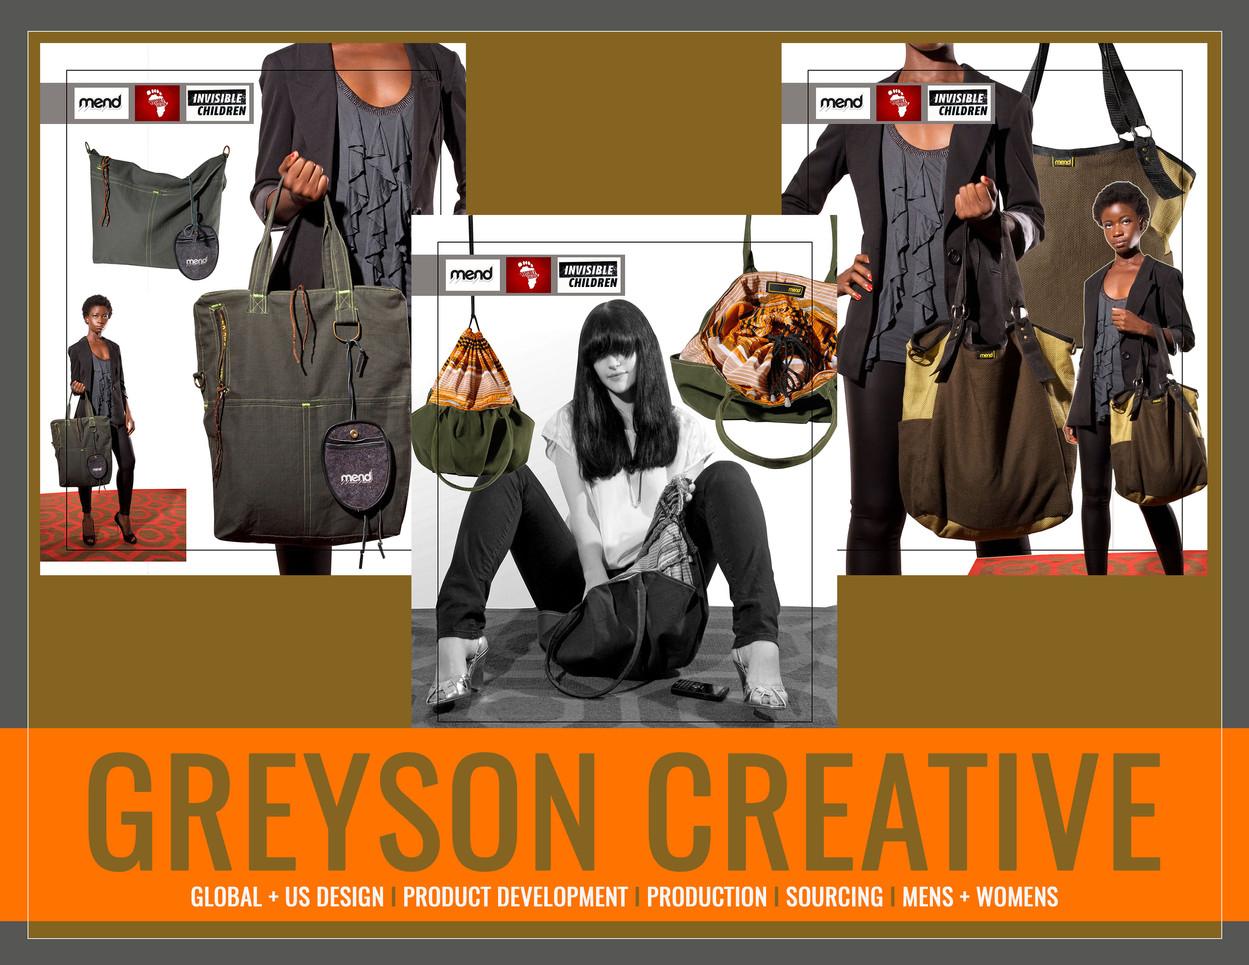 MEND: Greyson Creative by Lukas Greyson